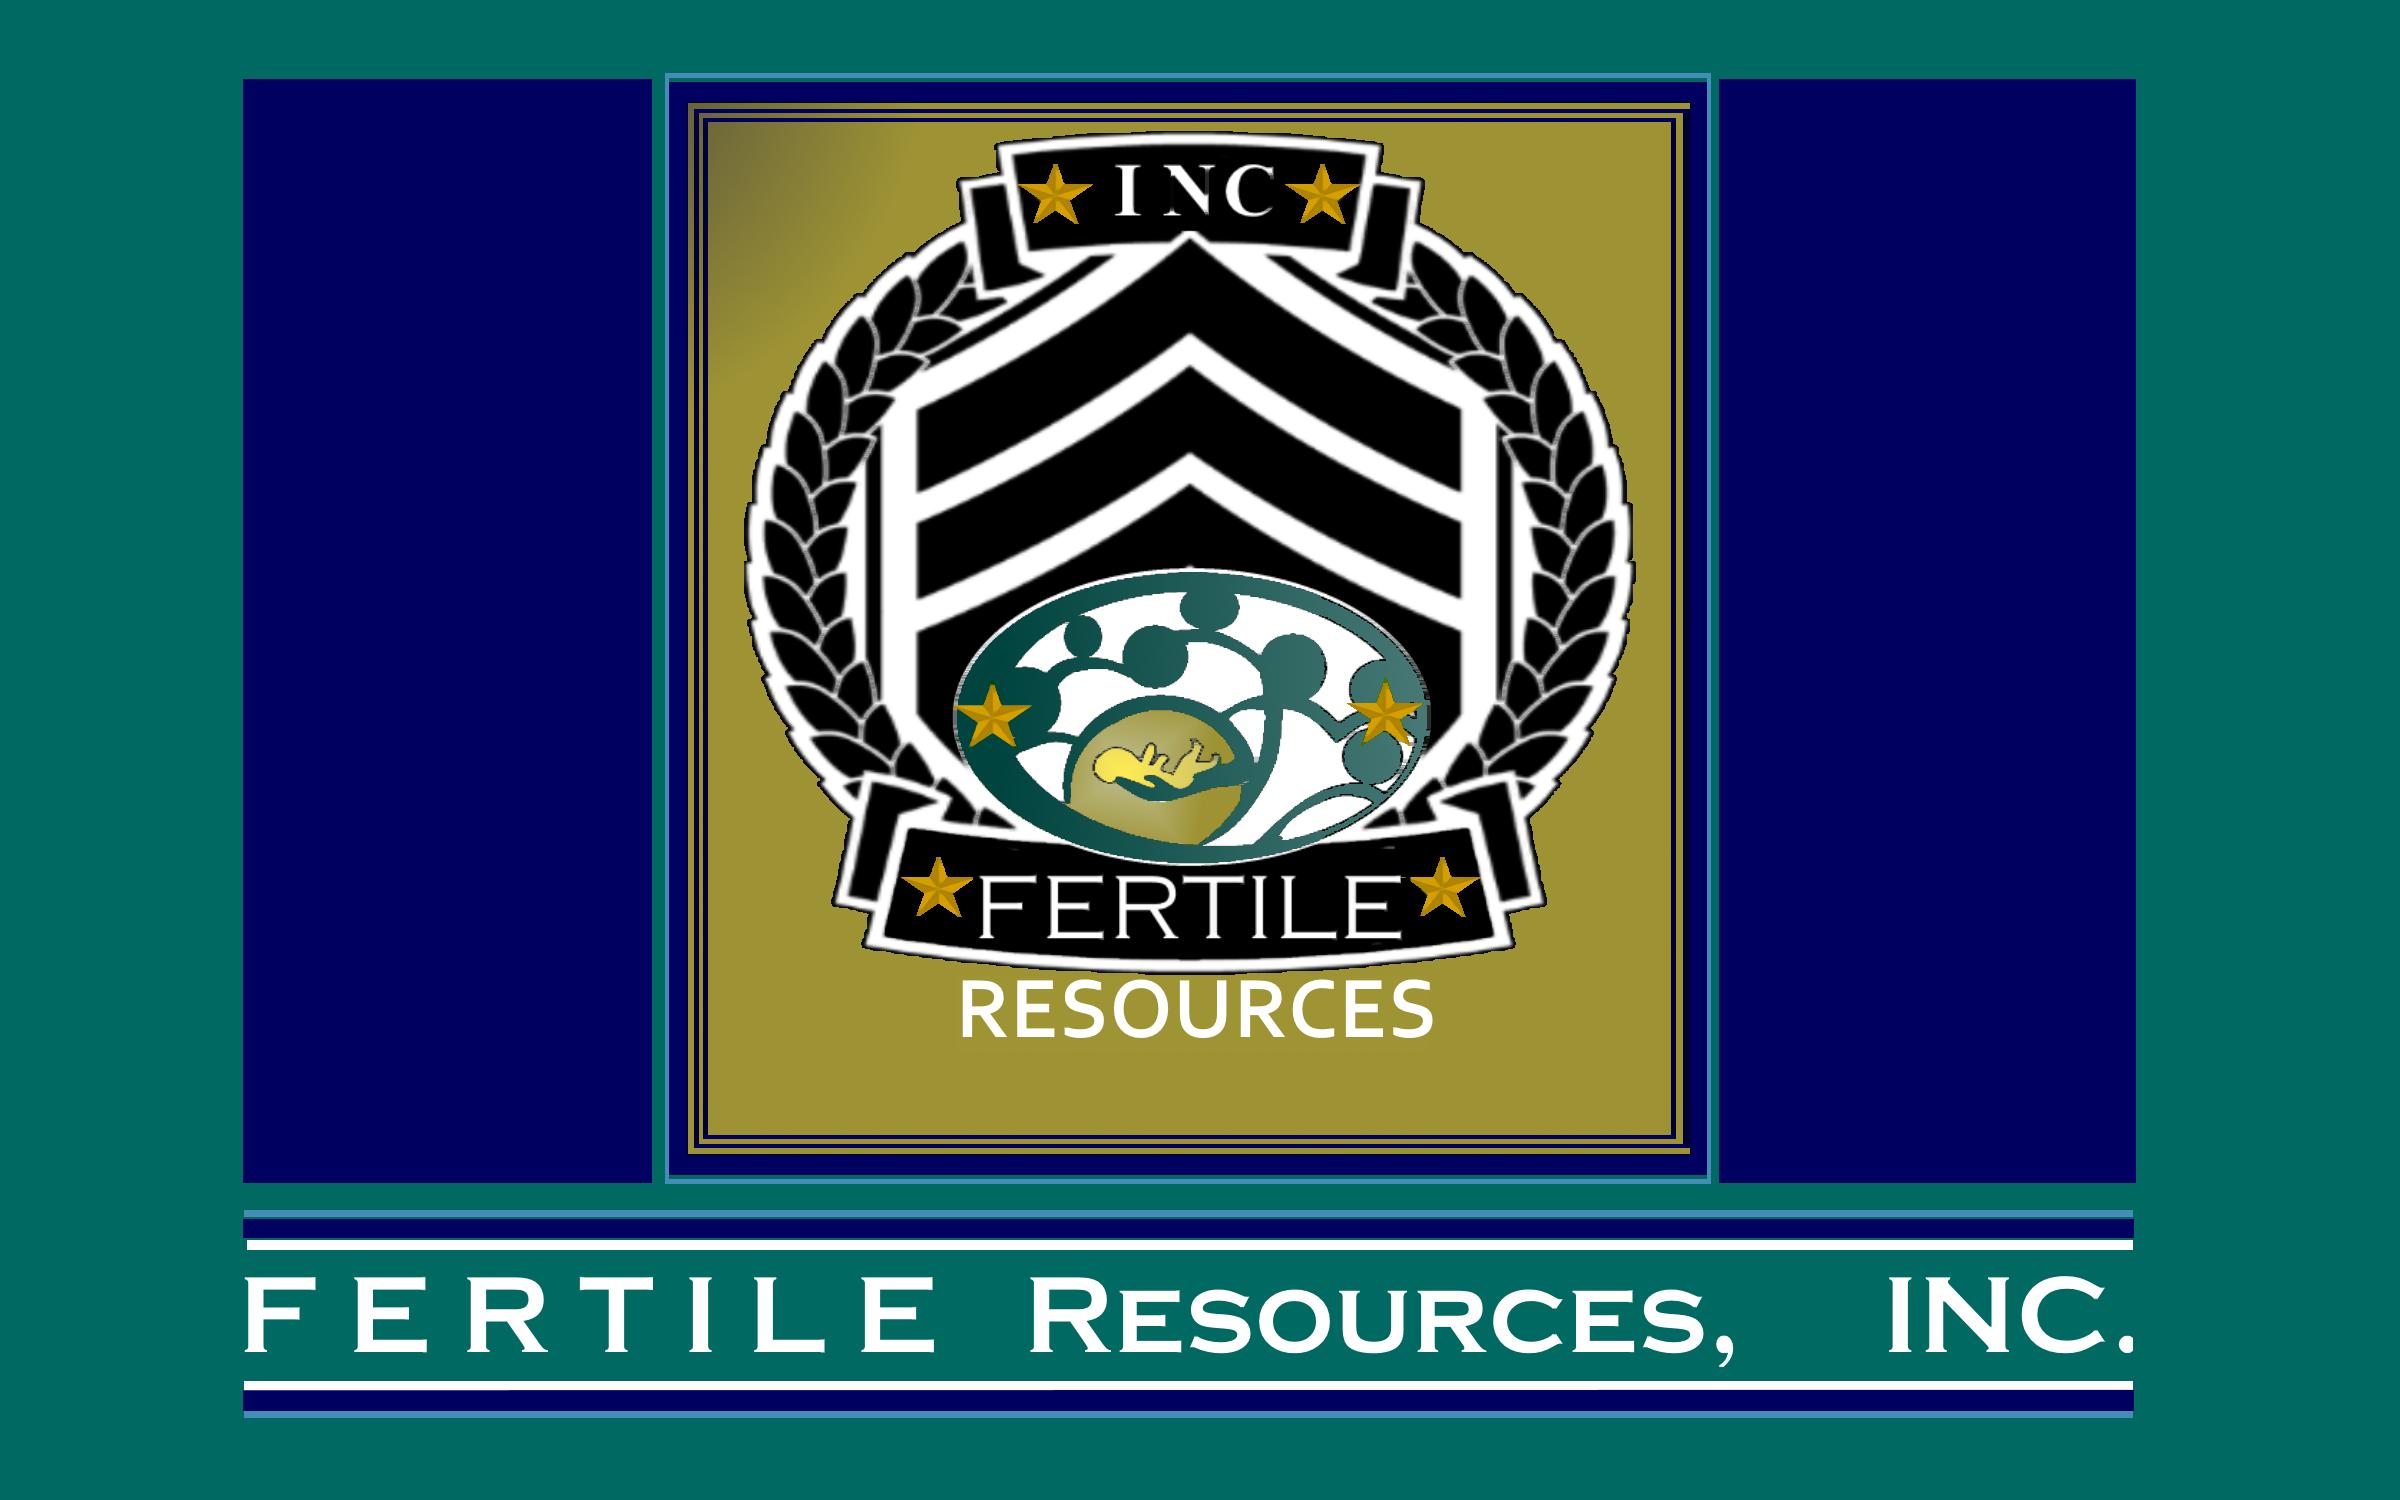 Logo Design by Roberto Bassi - Entry No. 117 in the Logo Design Contest Fertile Resources, Inc. Logo Design.